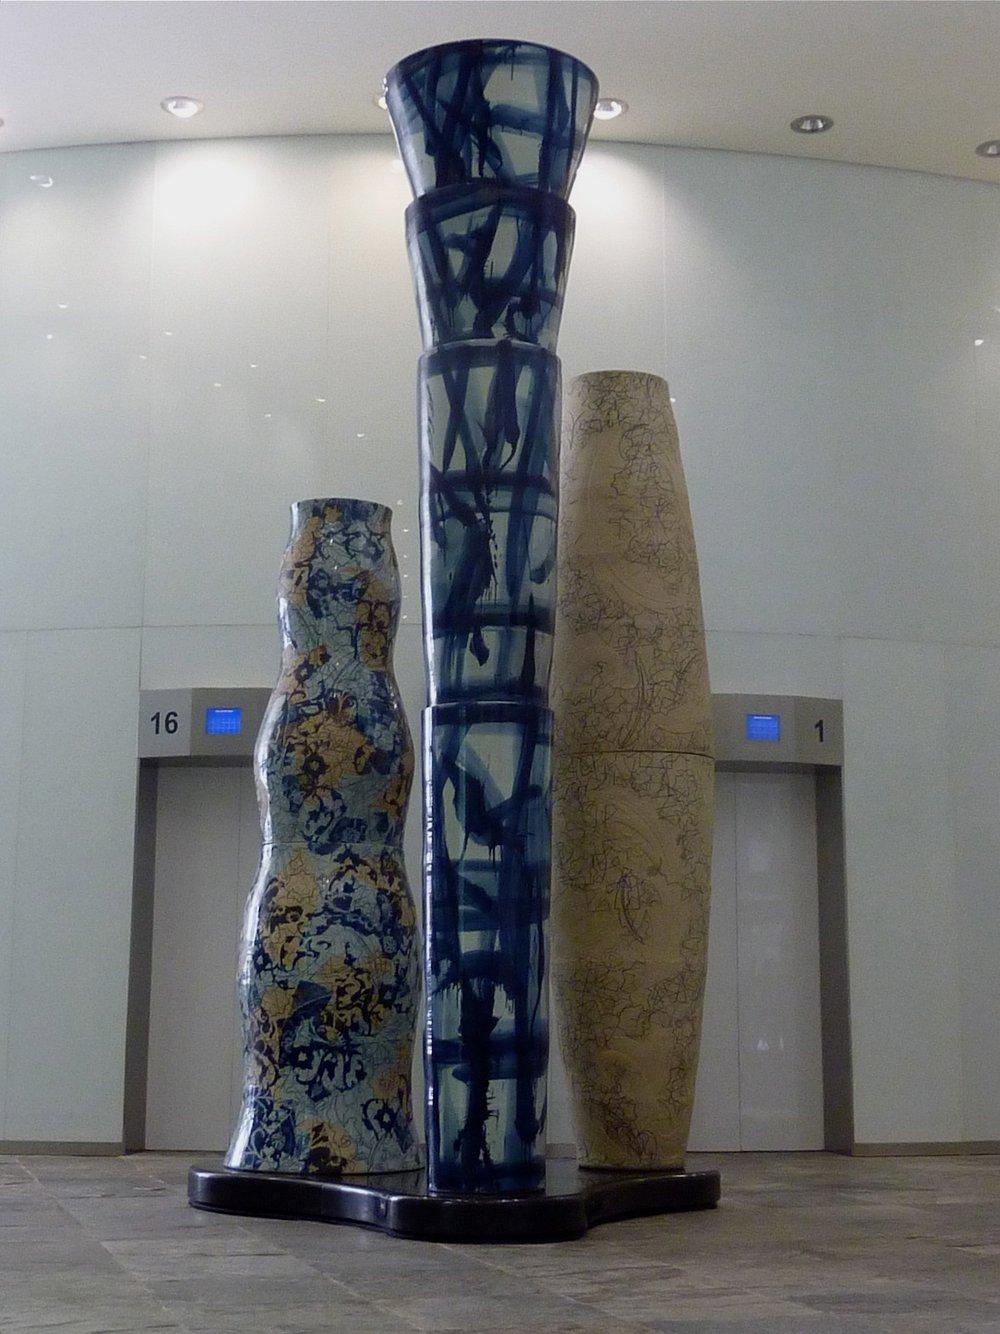 A Commission of Three Monumental Ceramic Sculptures, Doha, Qatar Arab Emirates, 2013